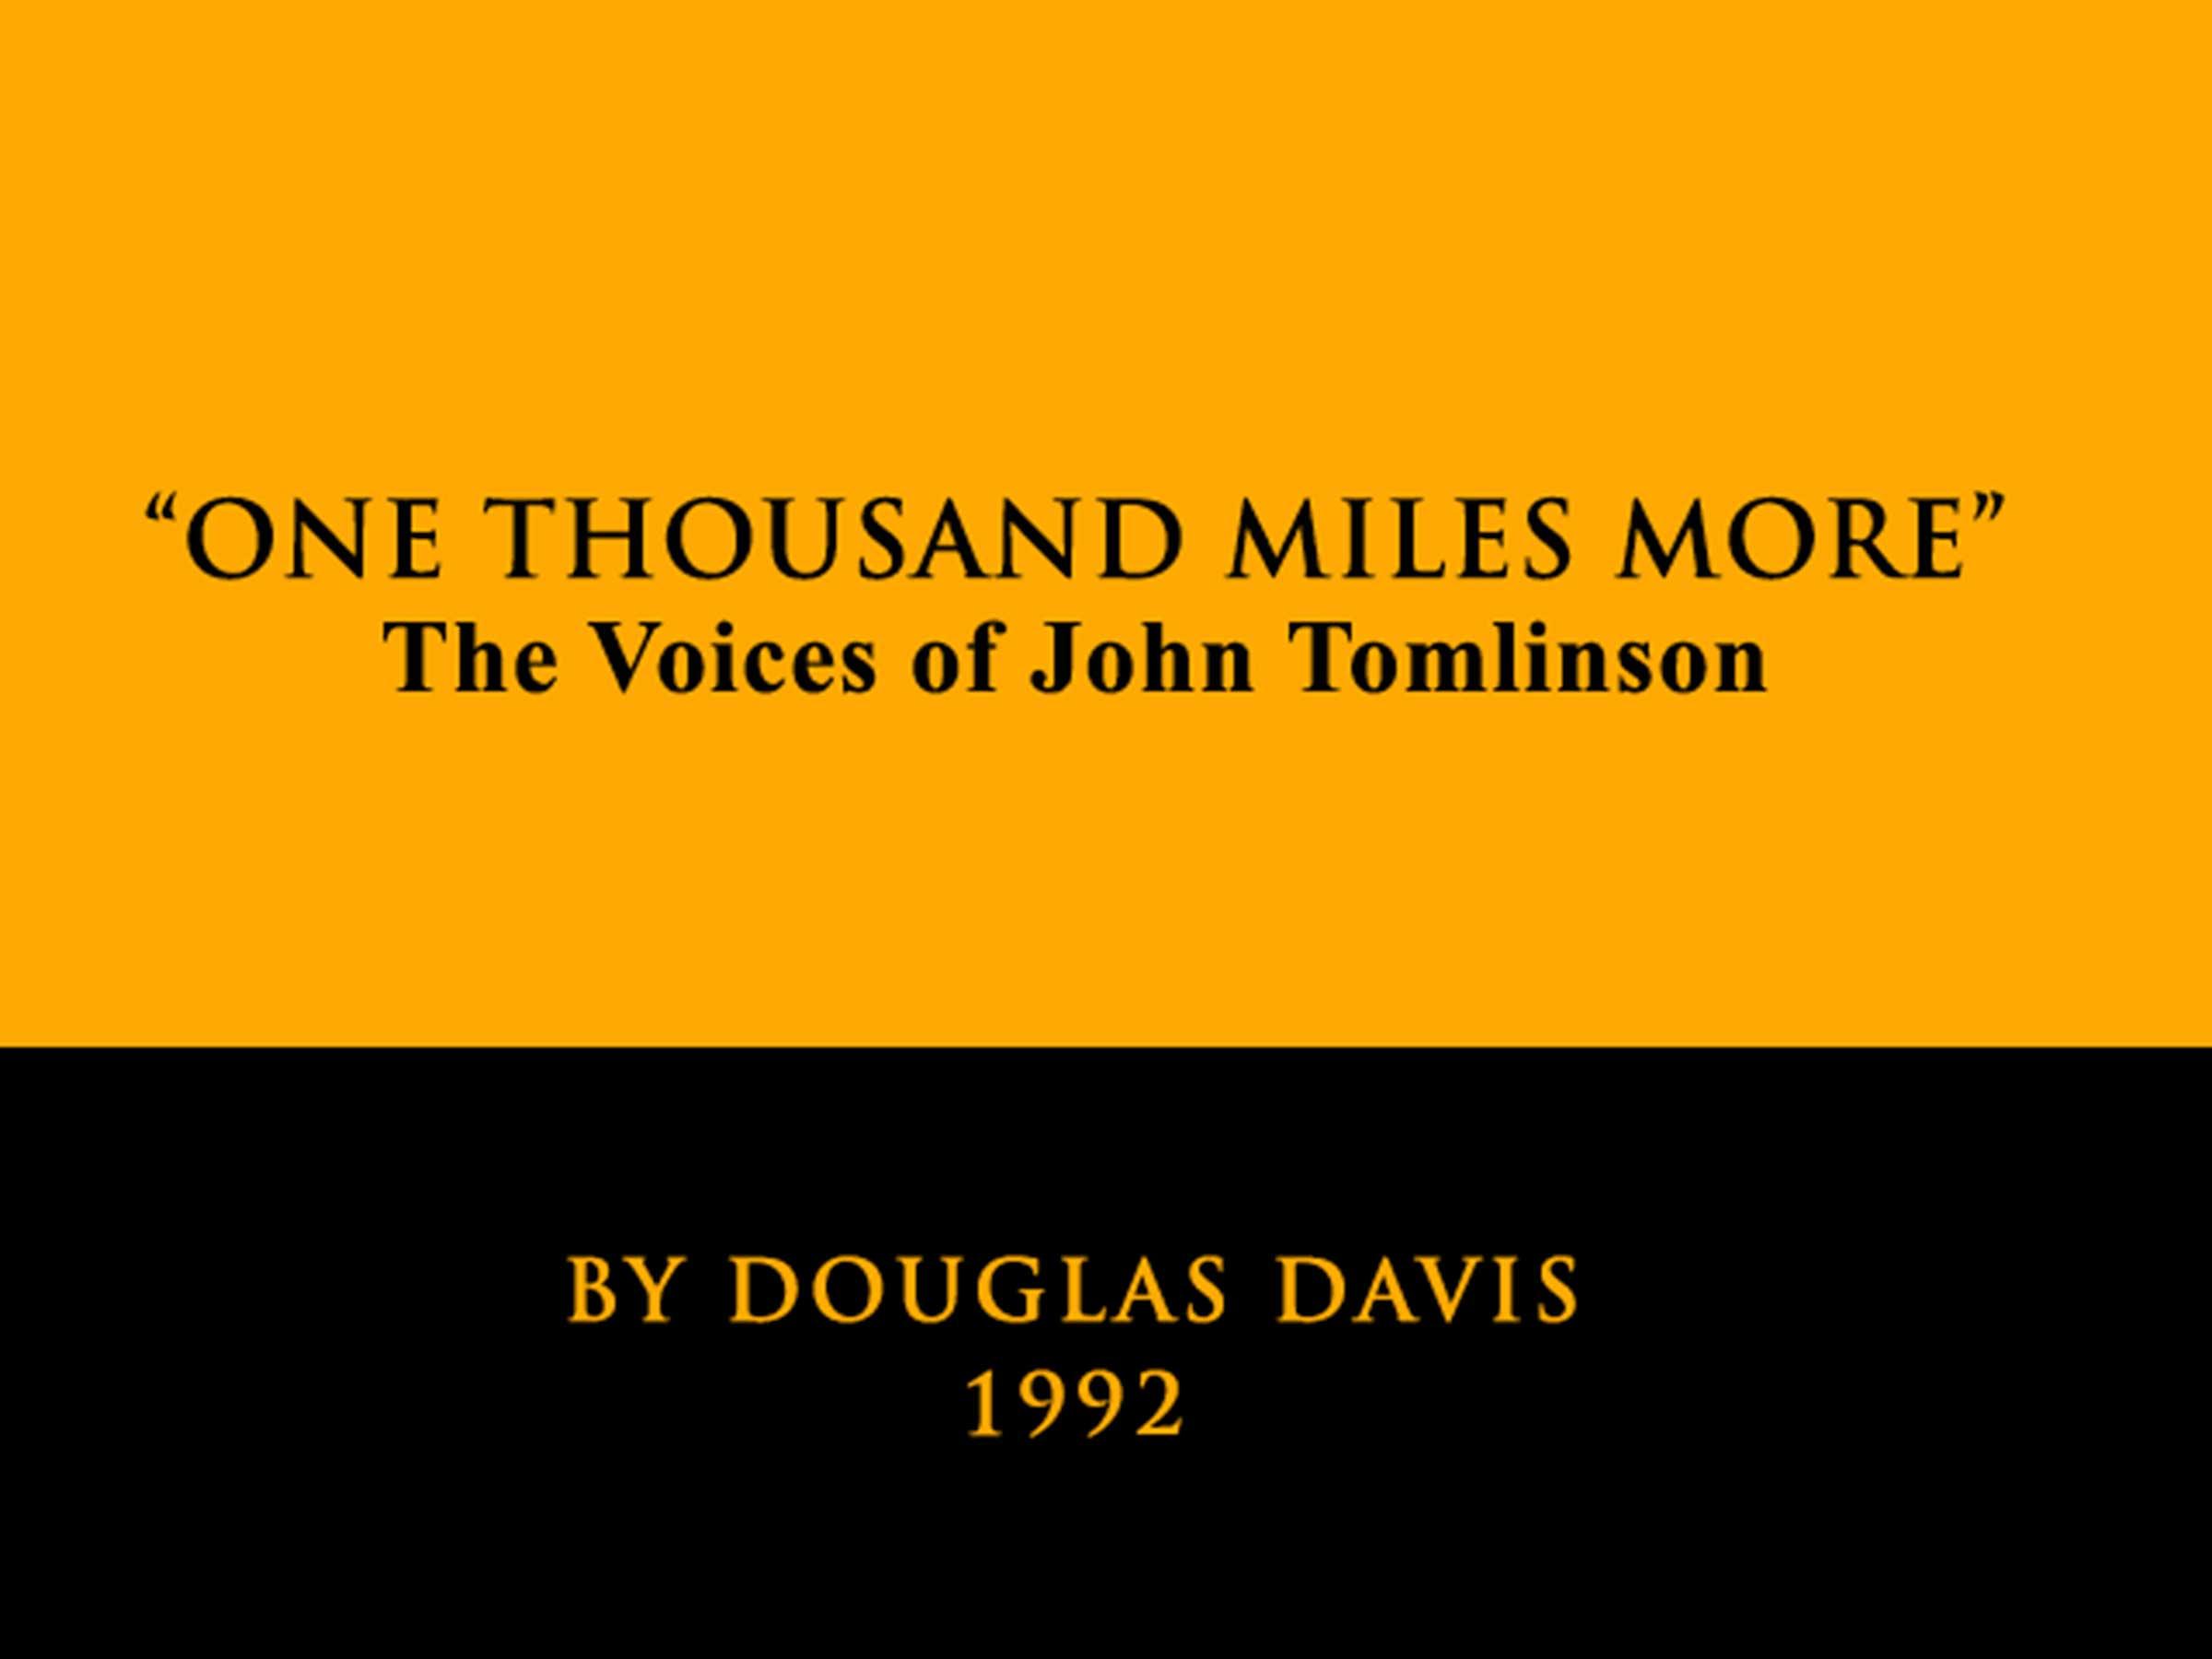 Essay by Douglas Davis